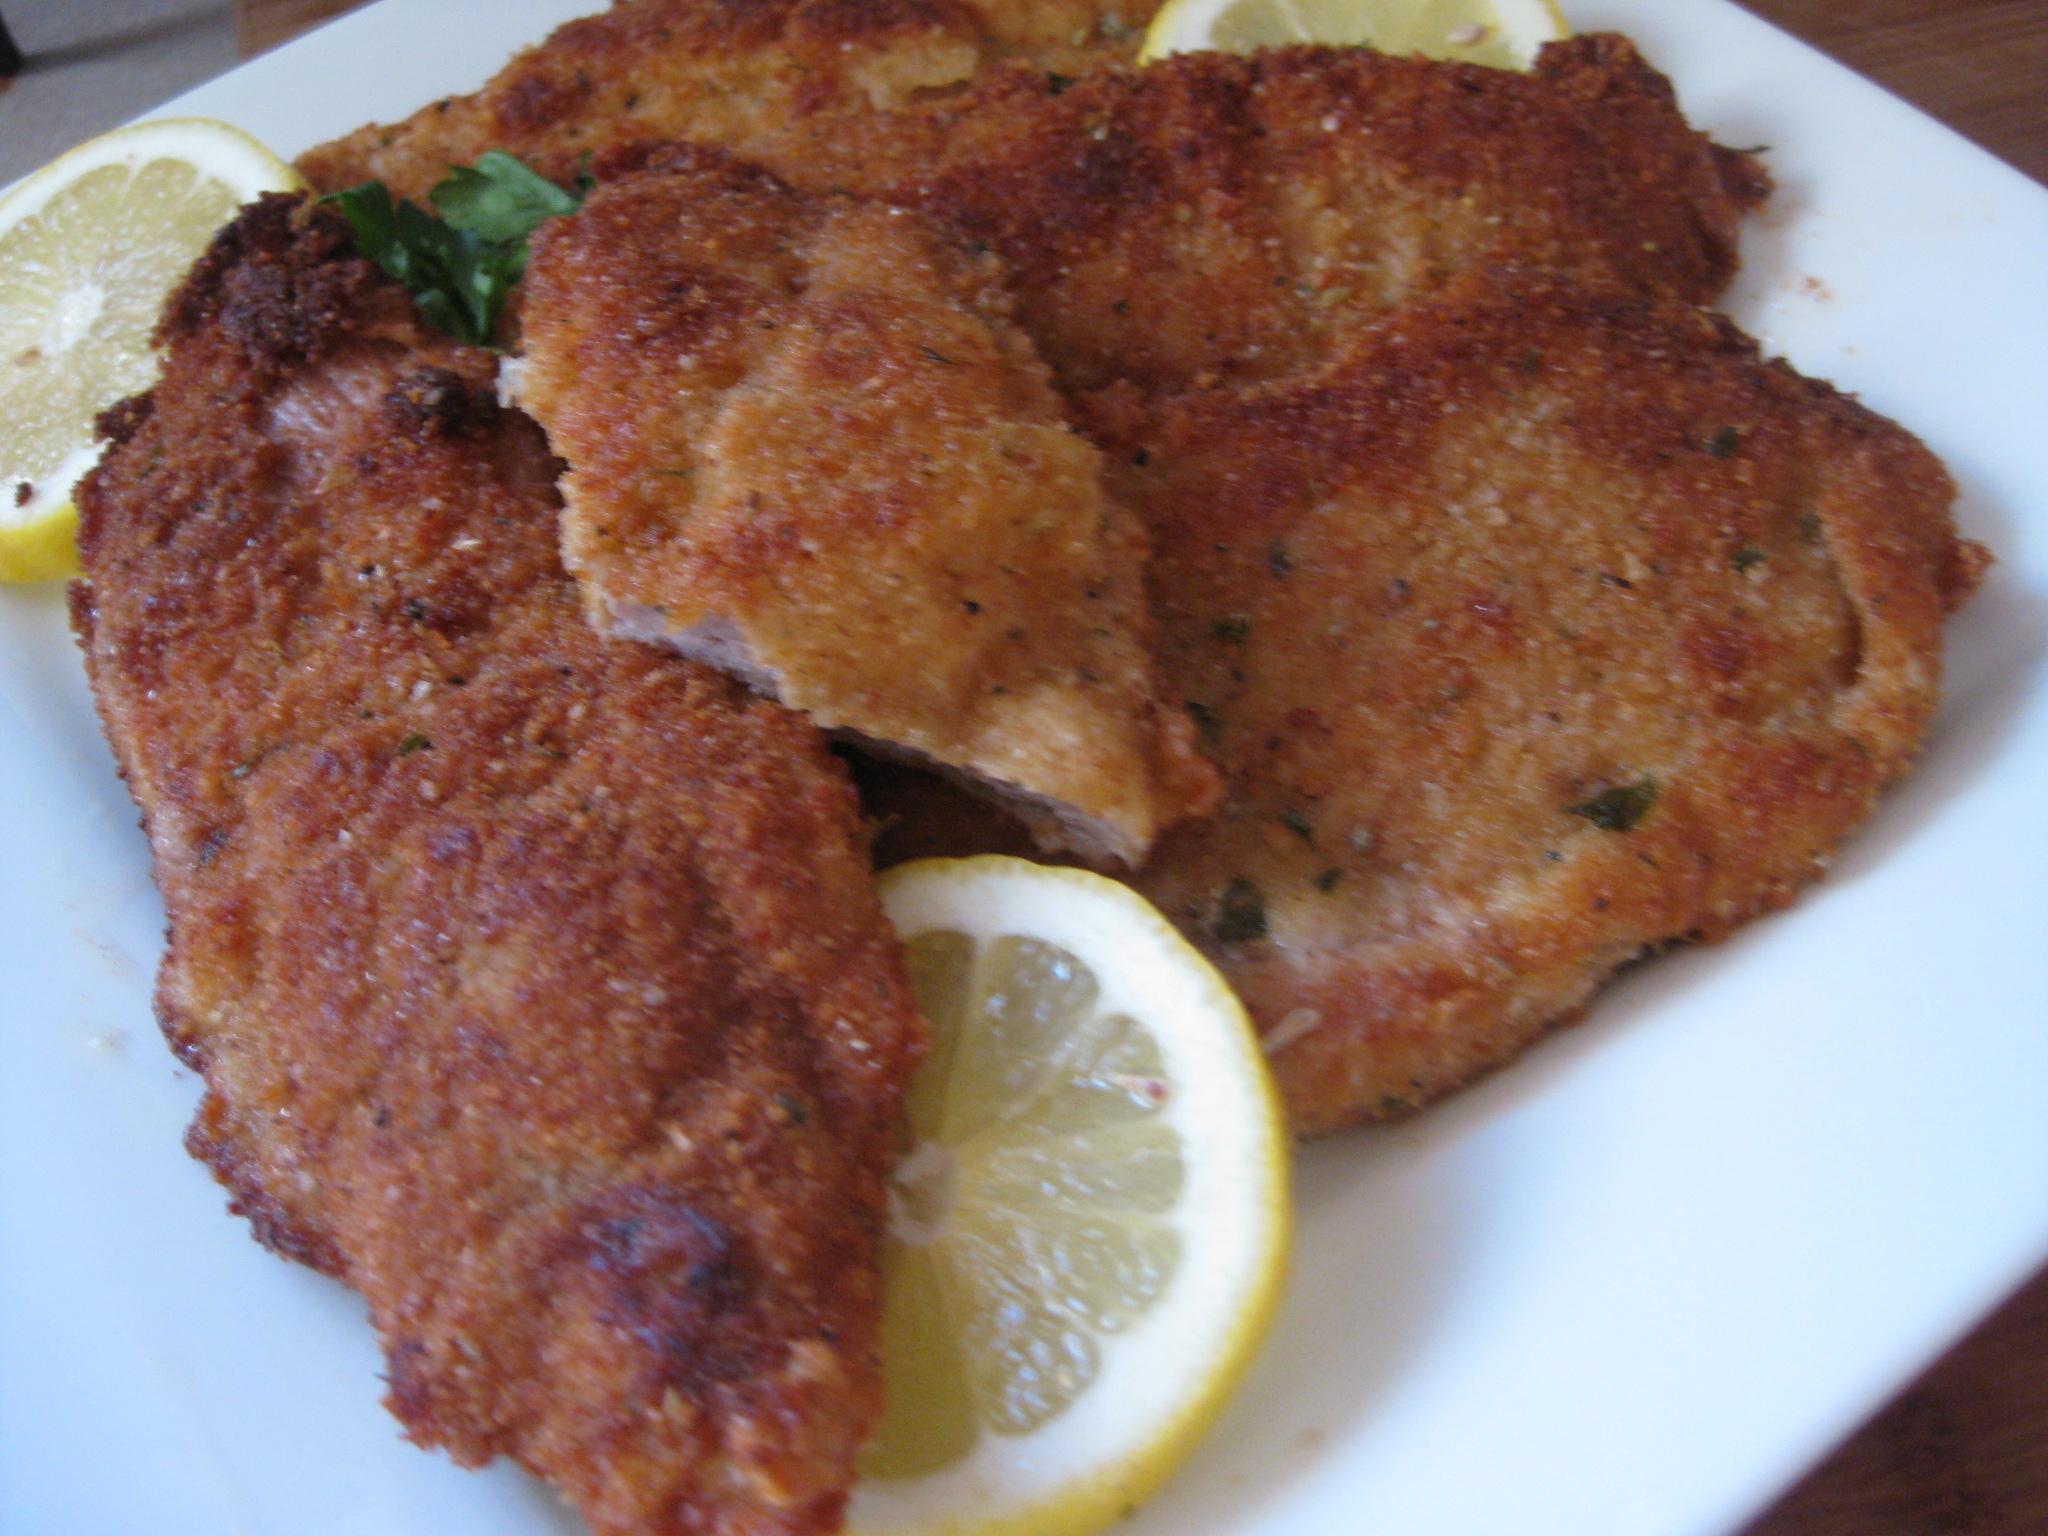 ... schnitzel recipe ingredients pork schnitzel photo pork schnitzel